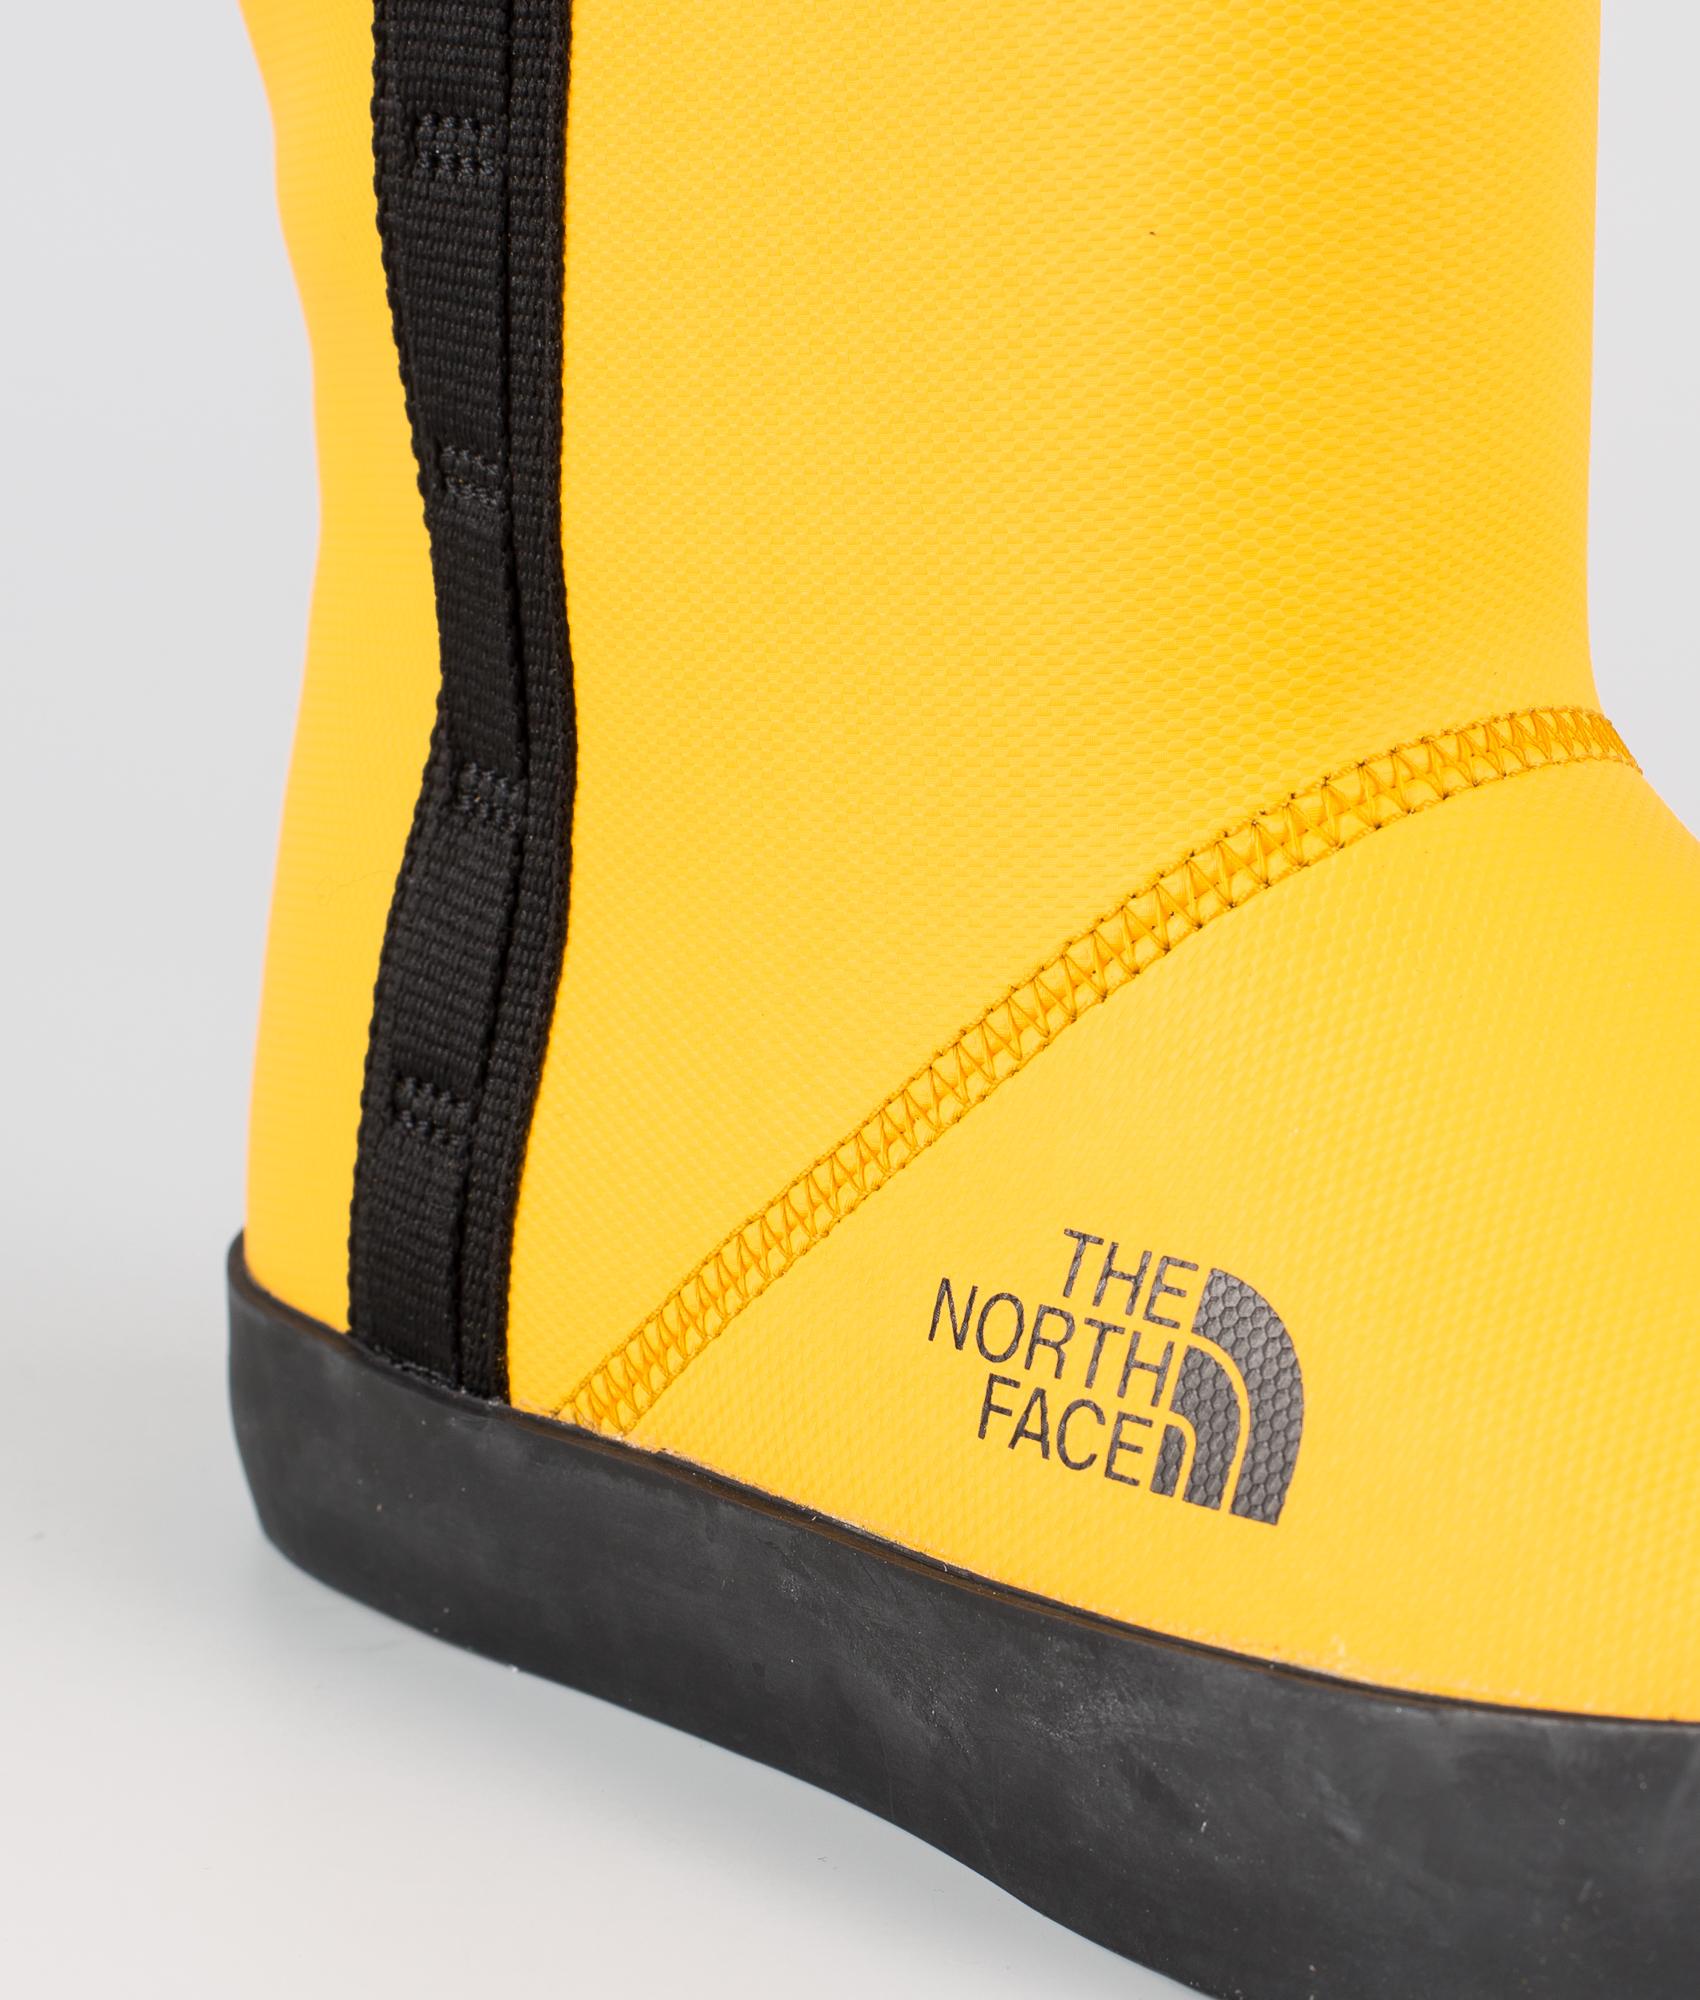 The North Face Regenstiefel & Winterstiefel The North Face